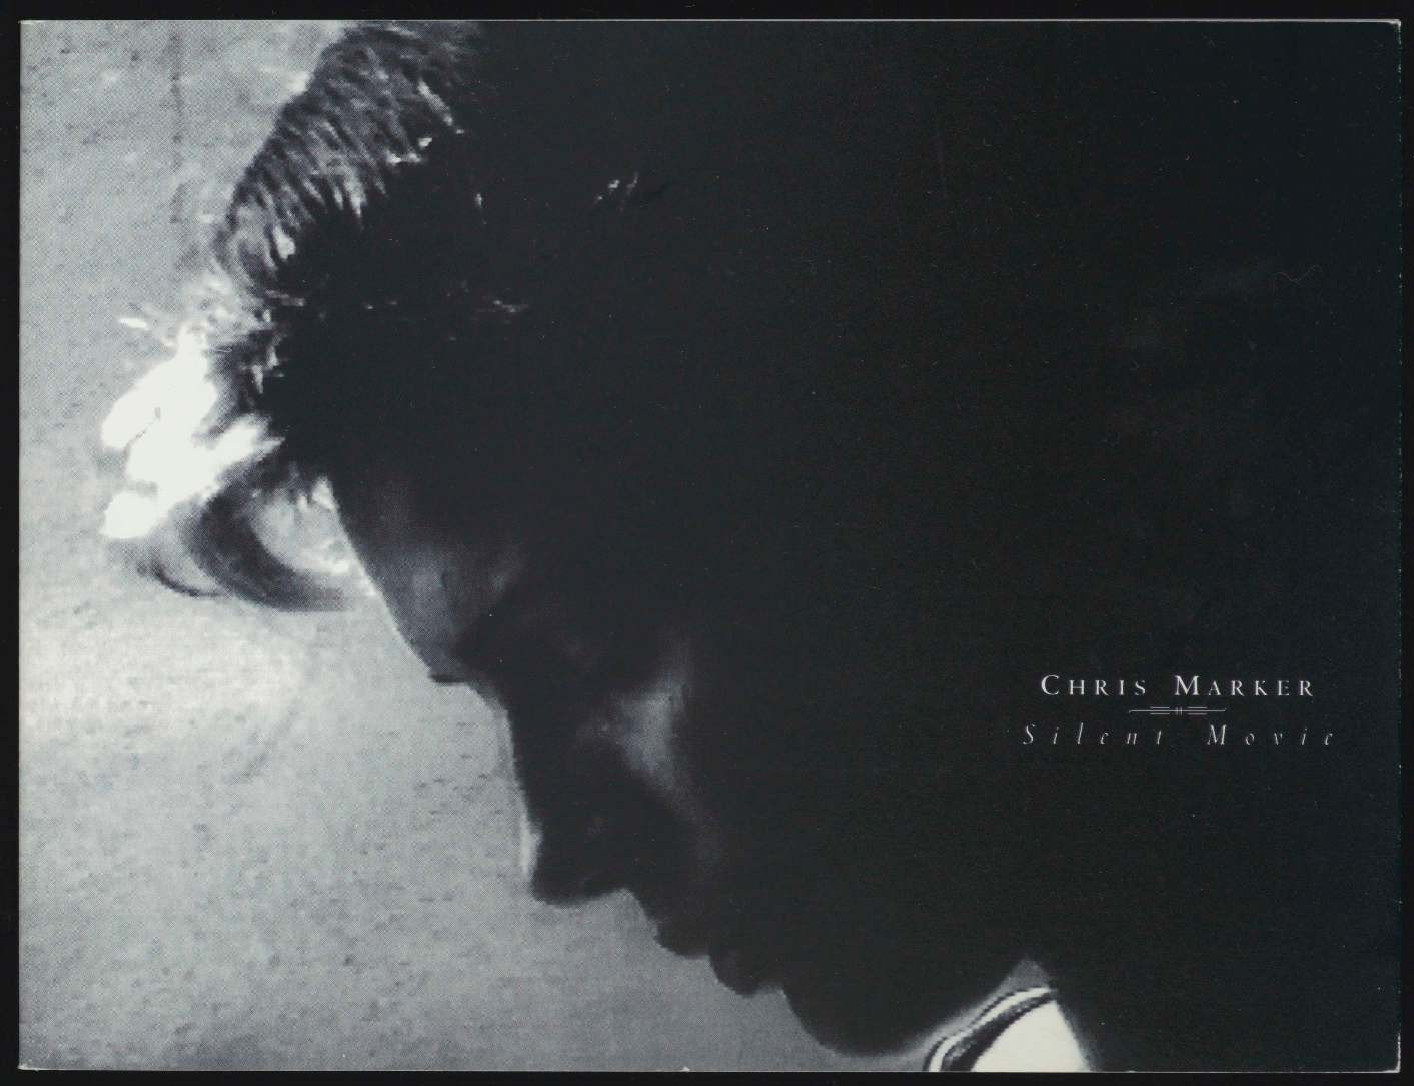 Chris Marker: Silent Movie (1995)